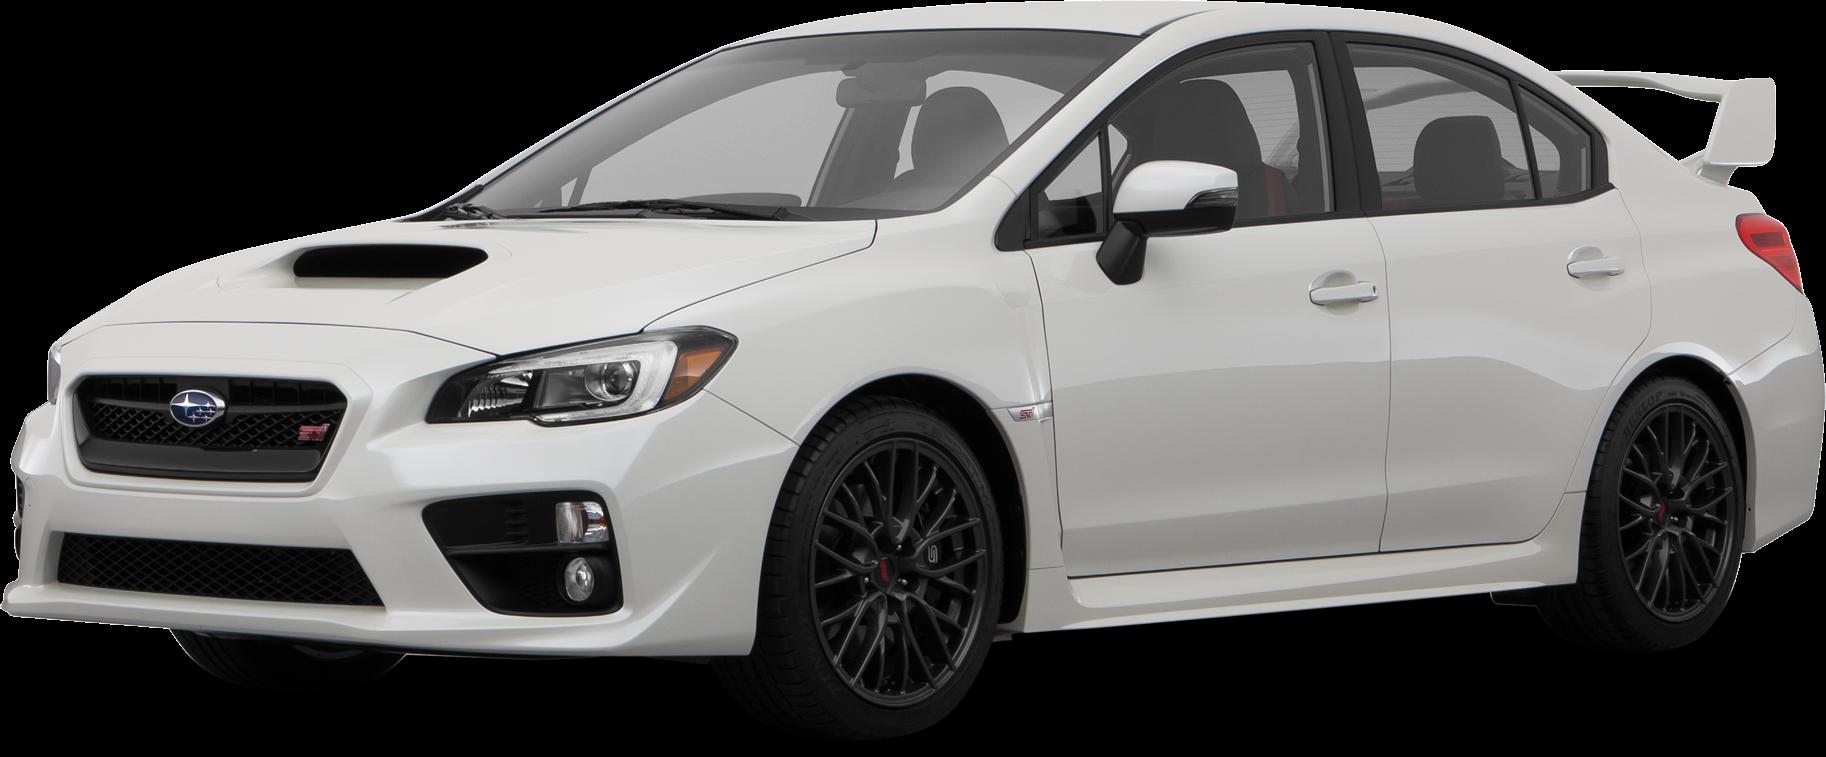 2015 Subaru WRX   Pricing, Ratings, Expert Review   Kelley